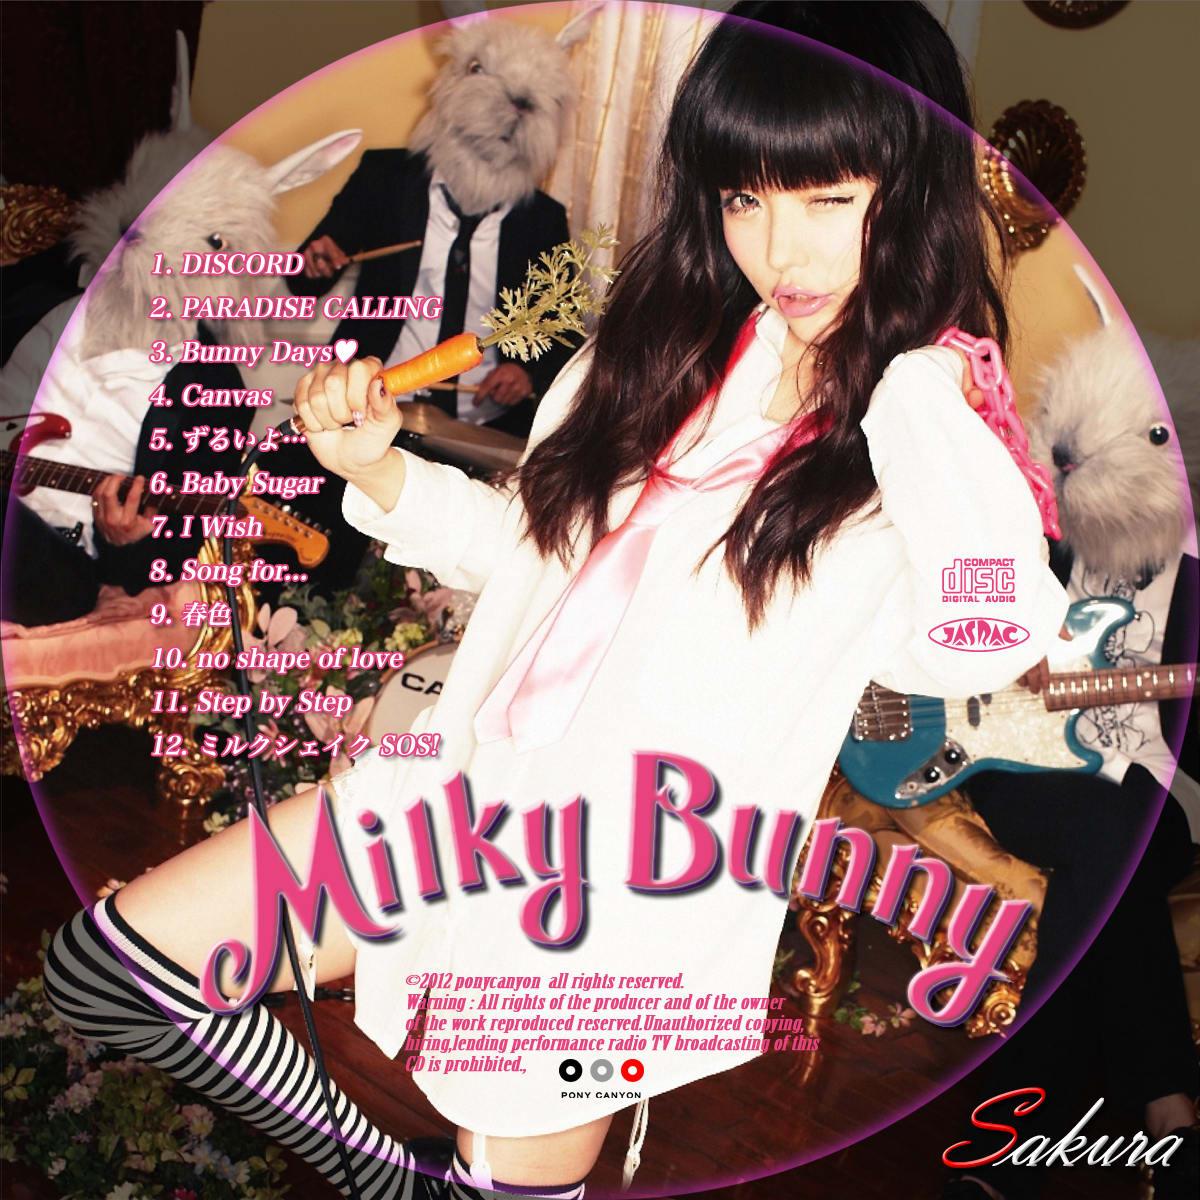 Milky Bunny、TAKUYAプロデュース曲PVでうさぎに変身 - 音楽ナタリー